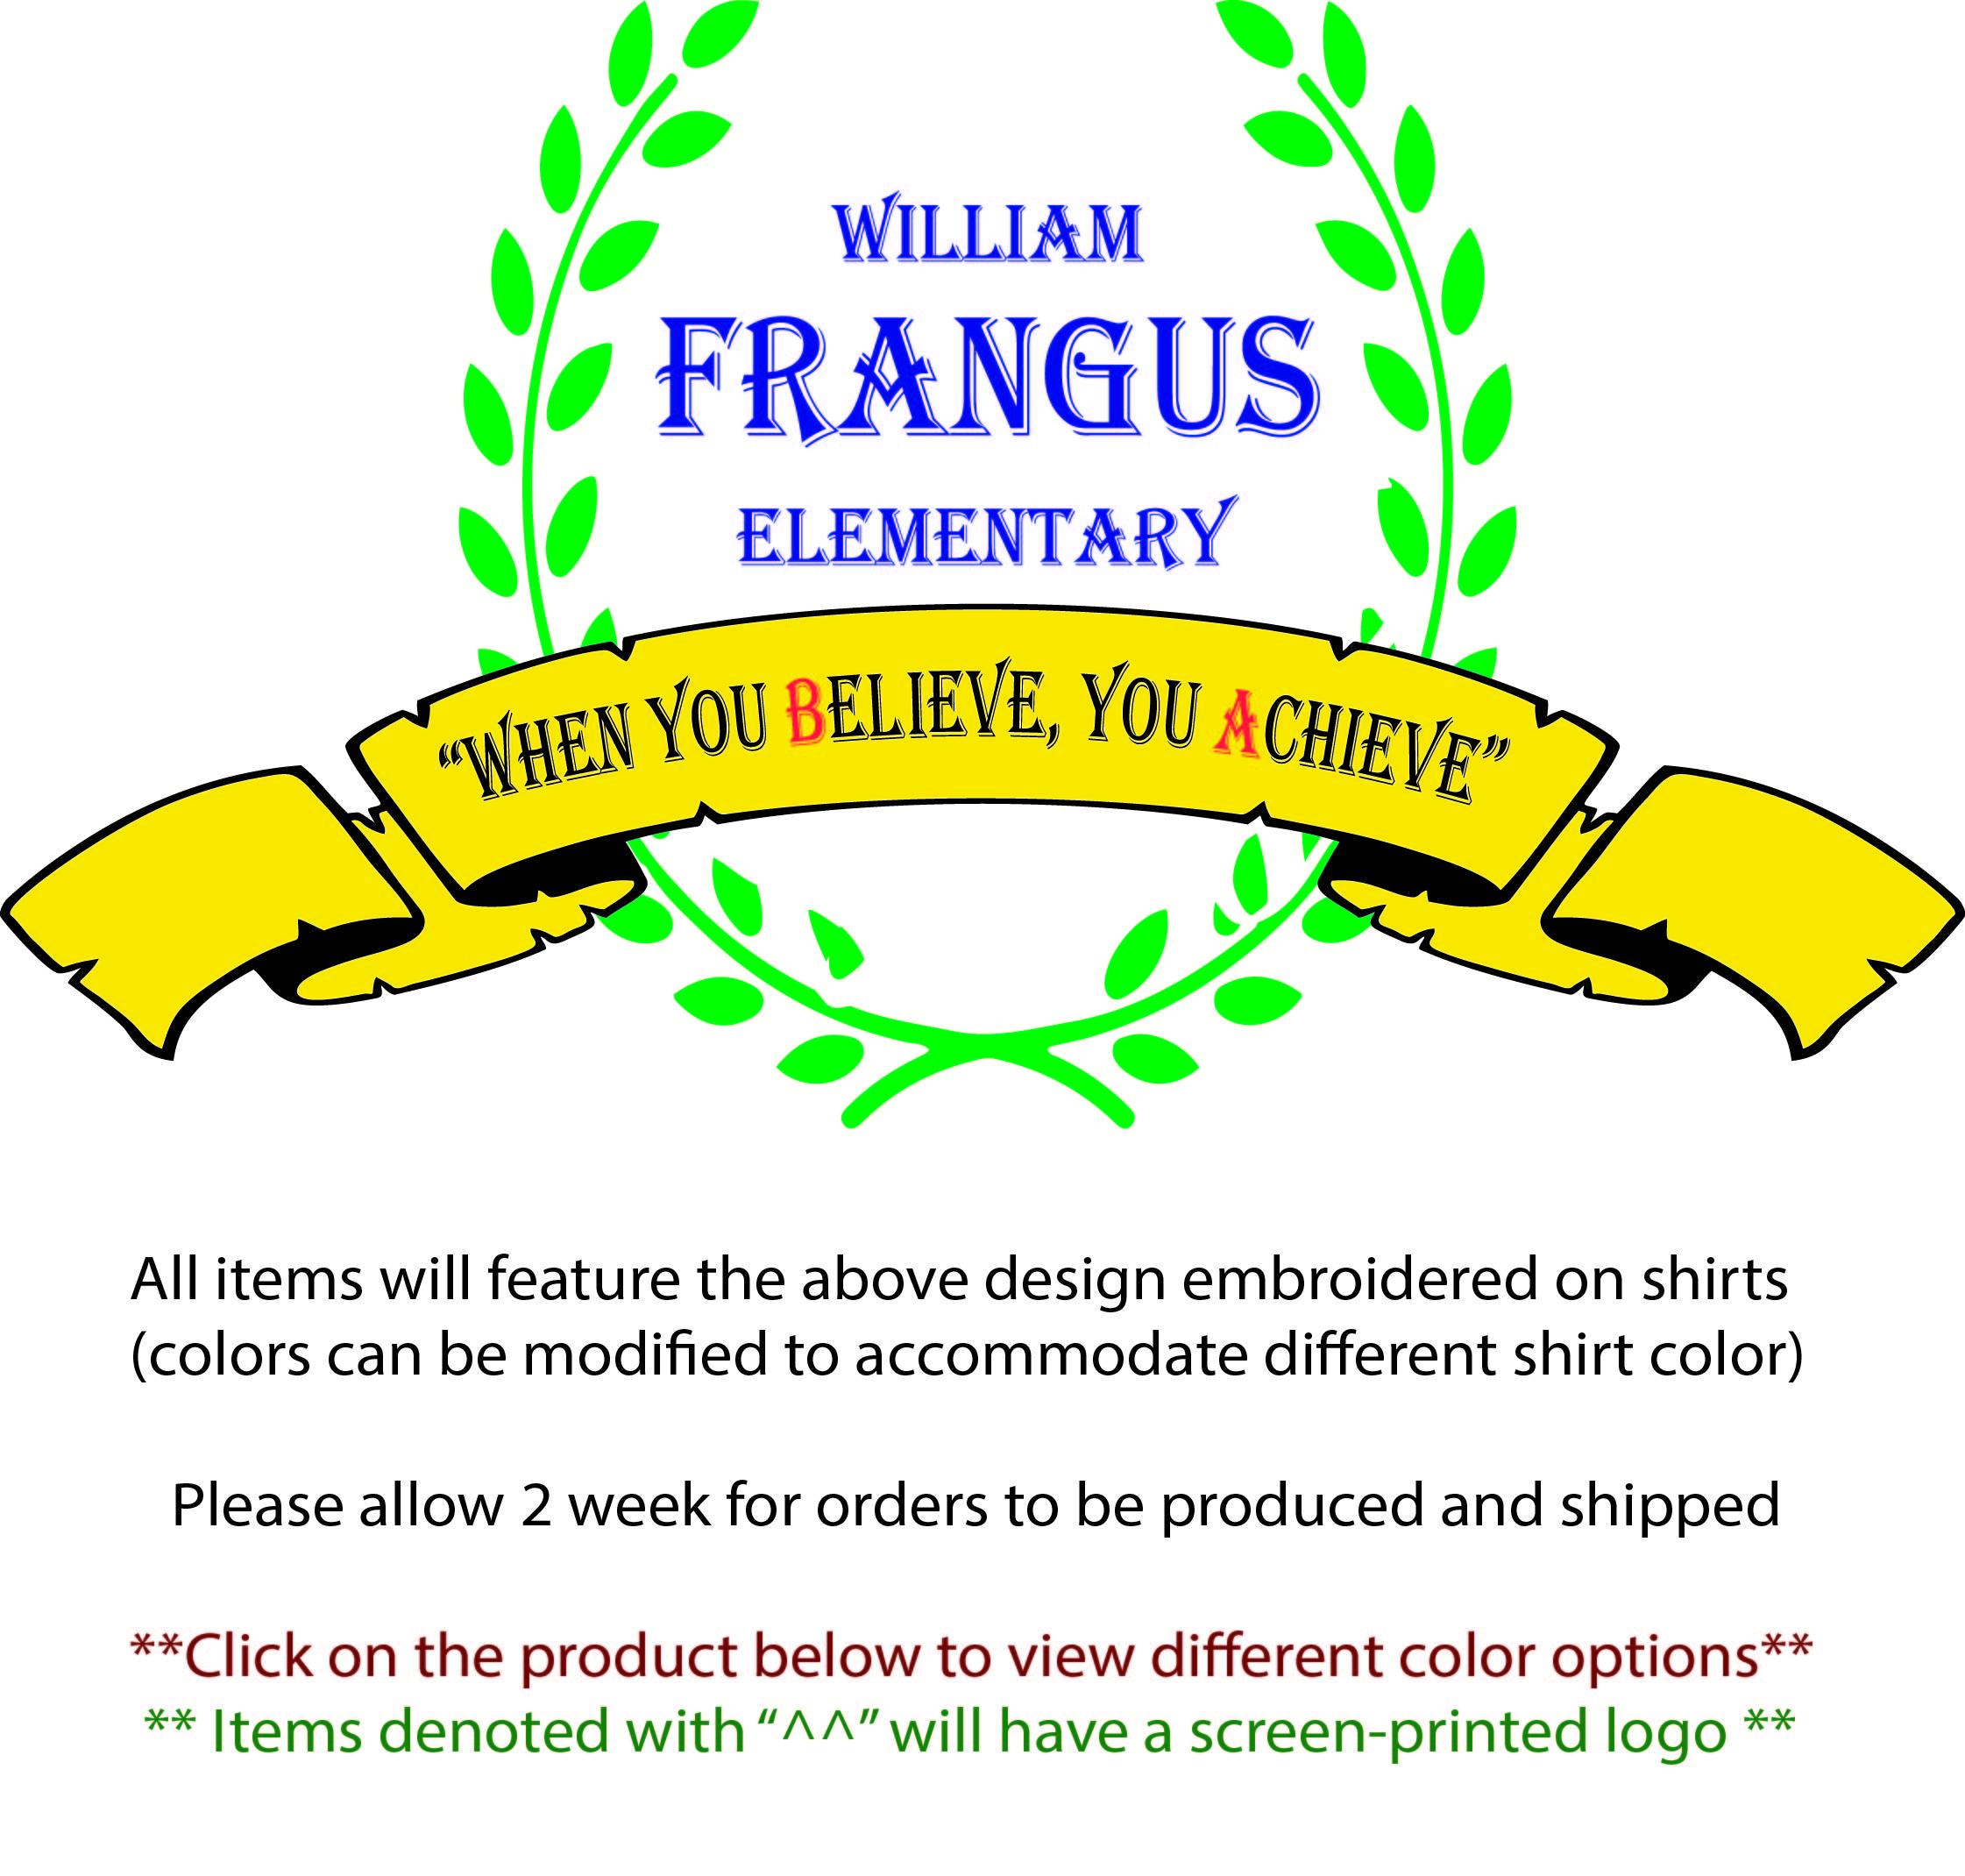 frangus-web-site-header-staff1.jpg